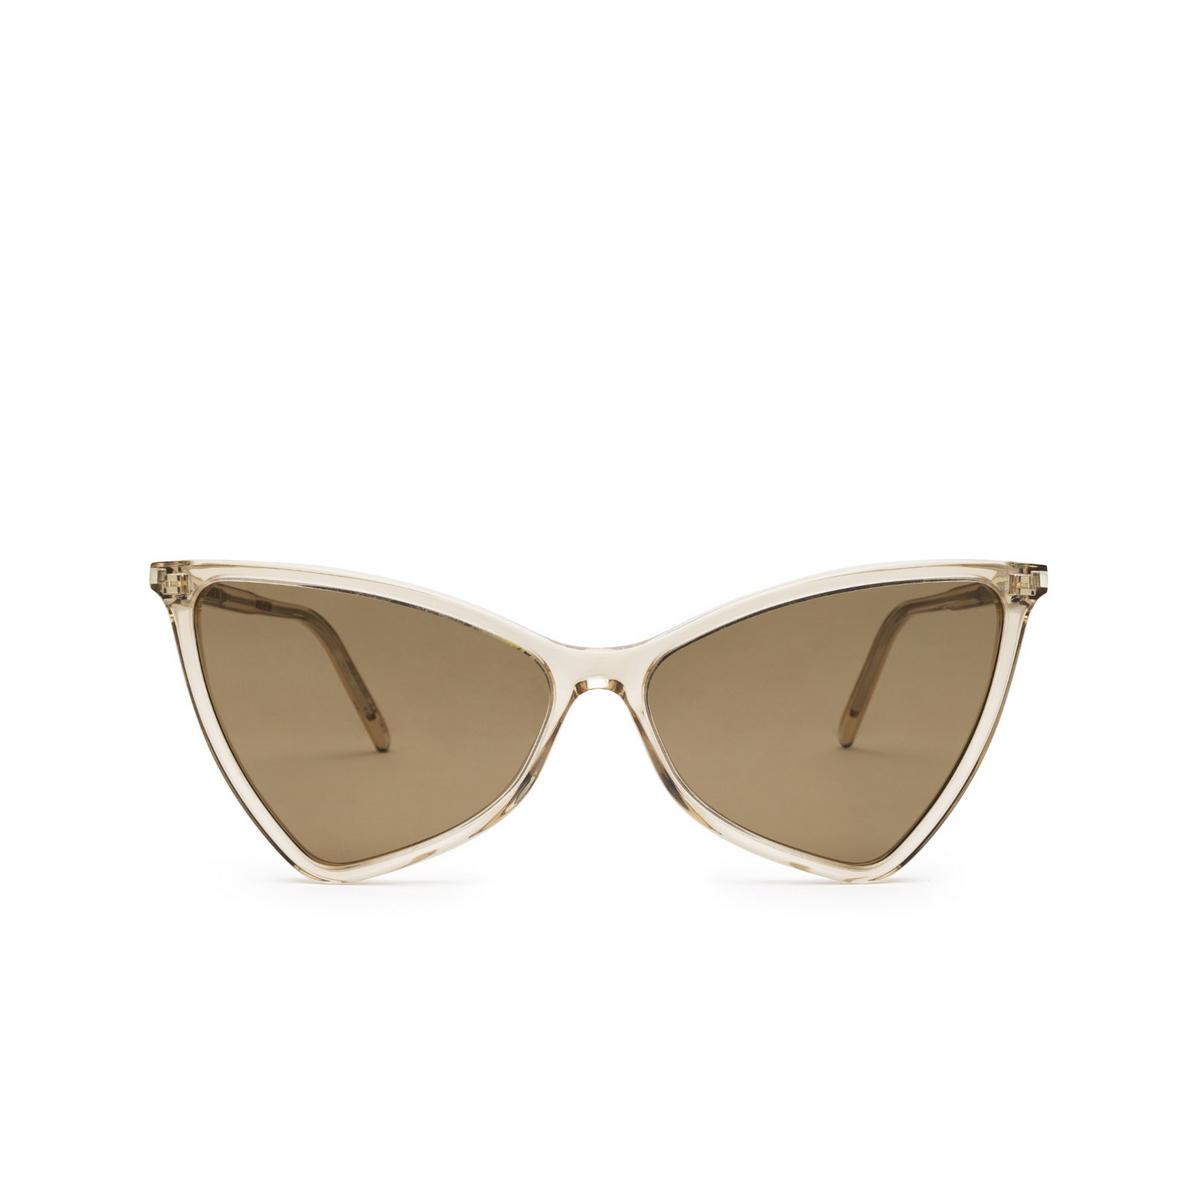 Saint Laurent® Irregular Sunglasses: Jerry SL 475 color Nude 005 - front view.